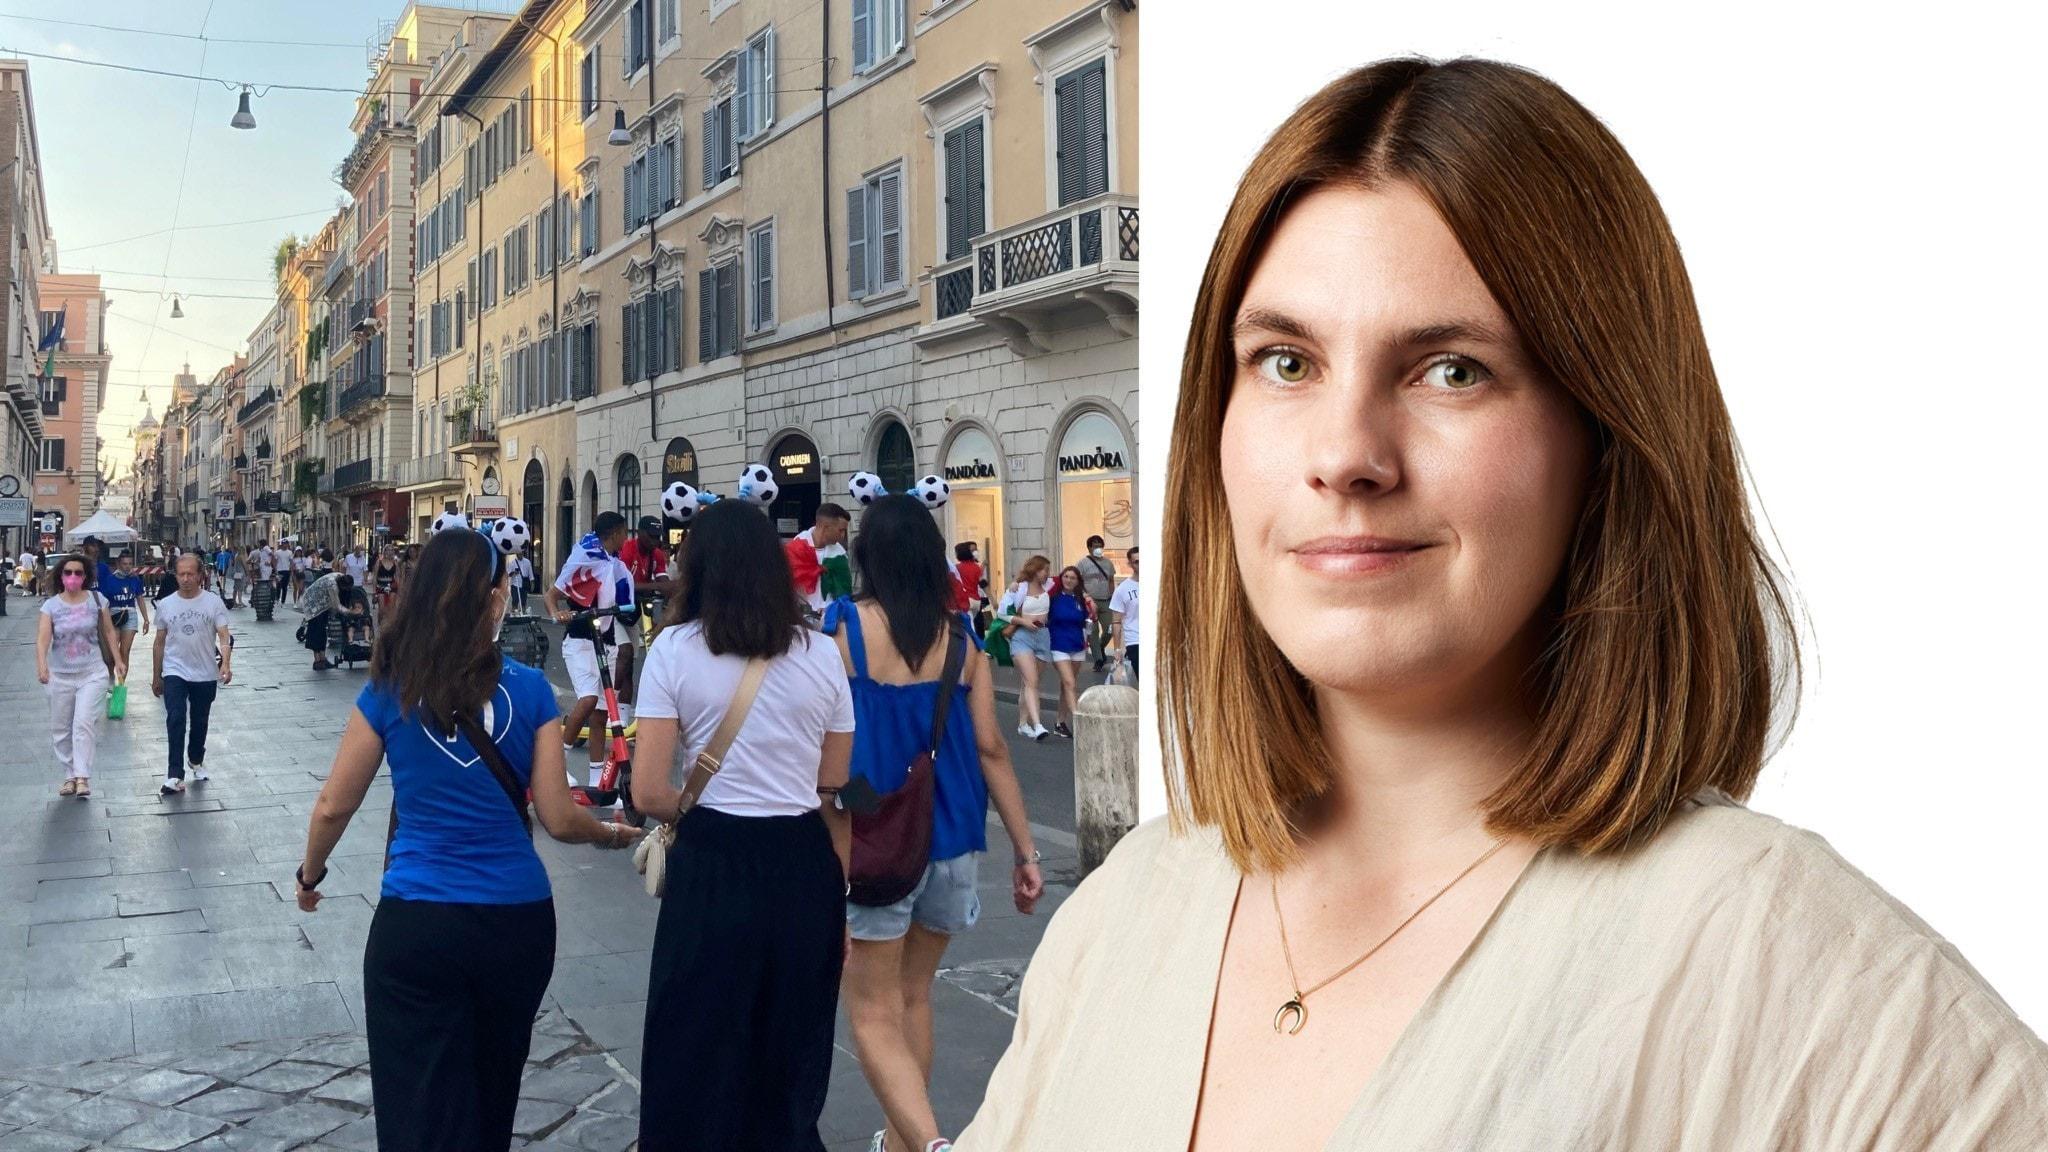 Folk längs gatorna i Rom